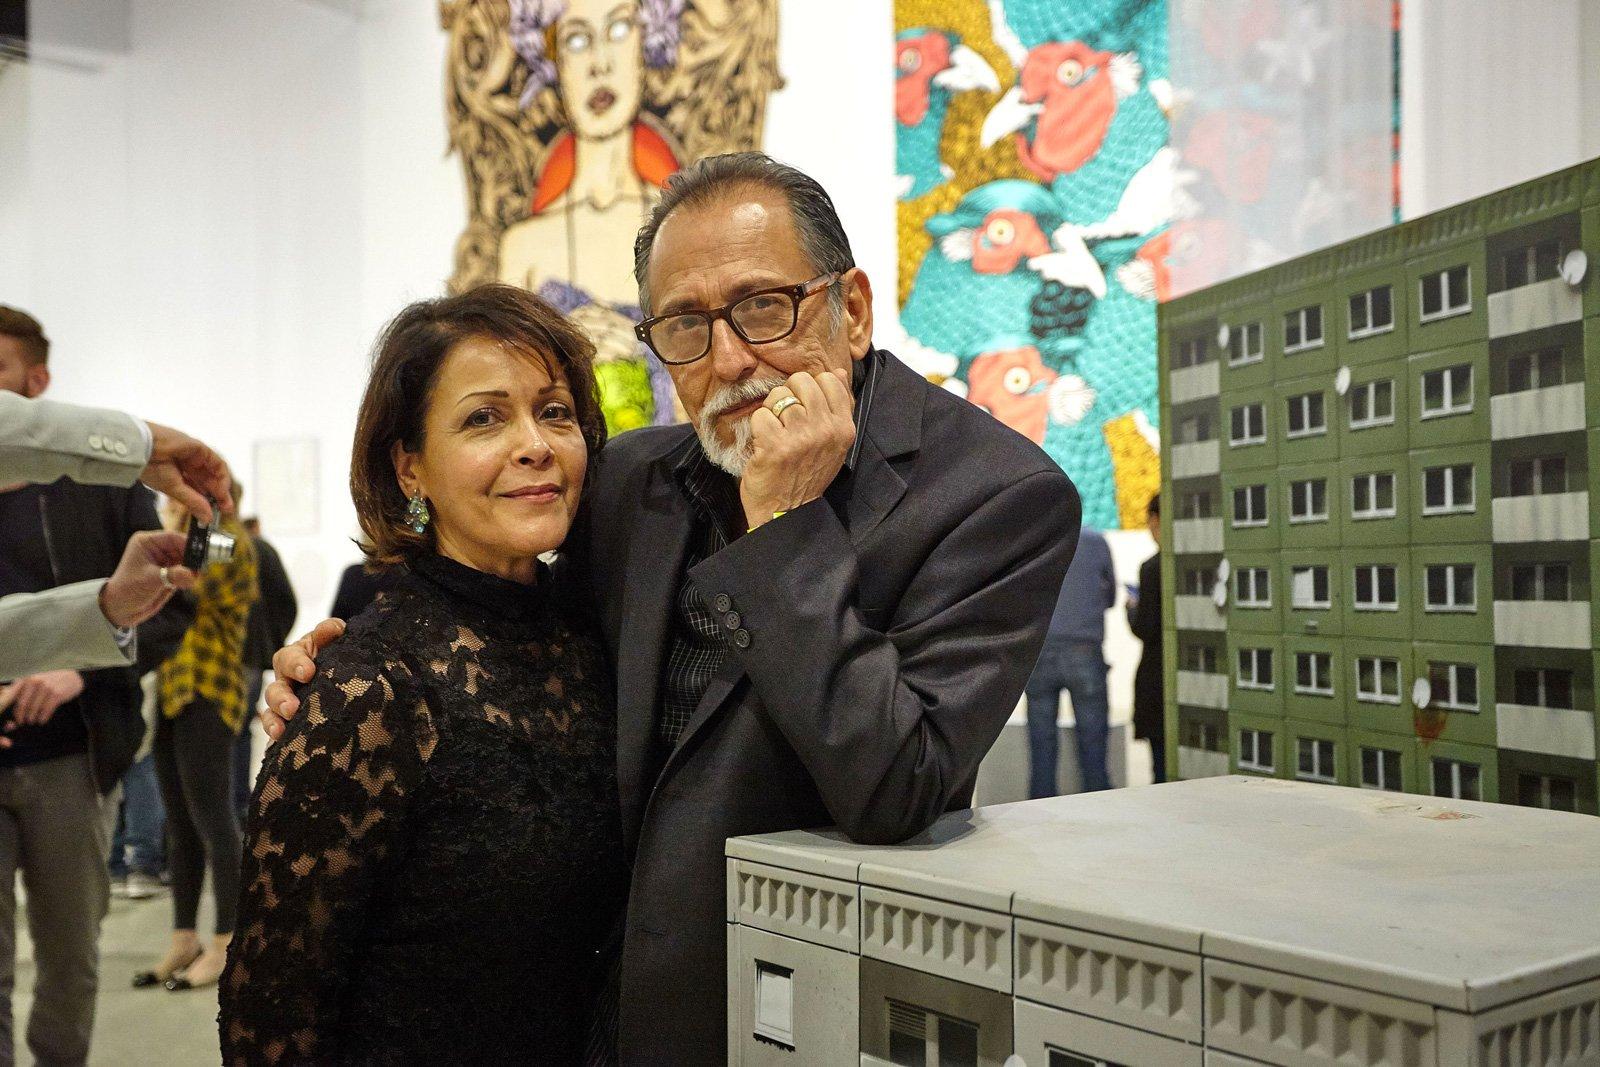 Chaz Bojorquez and his wife Christina, Rome, 2017 © Simon d'Exéa. Cross the Streets Inauguration at MACRO